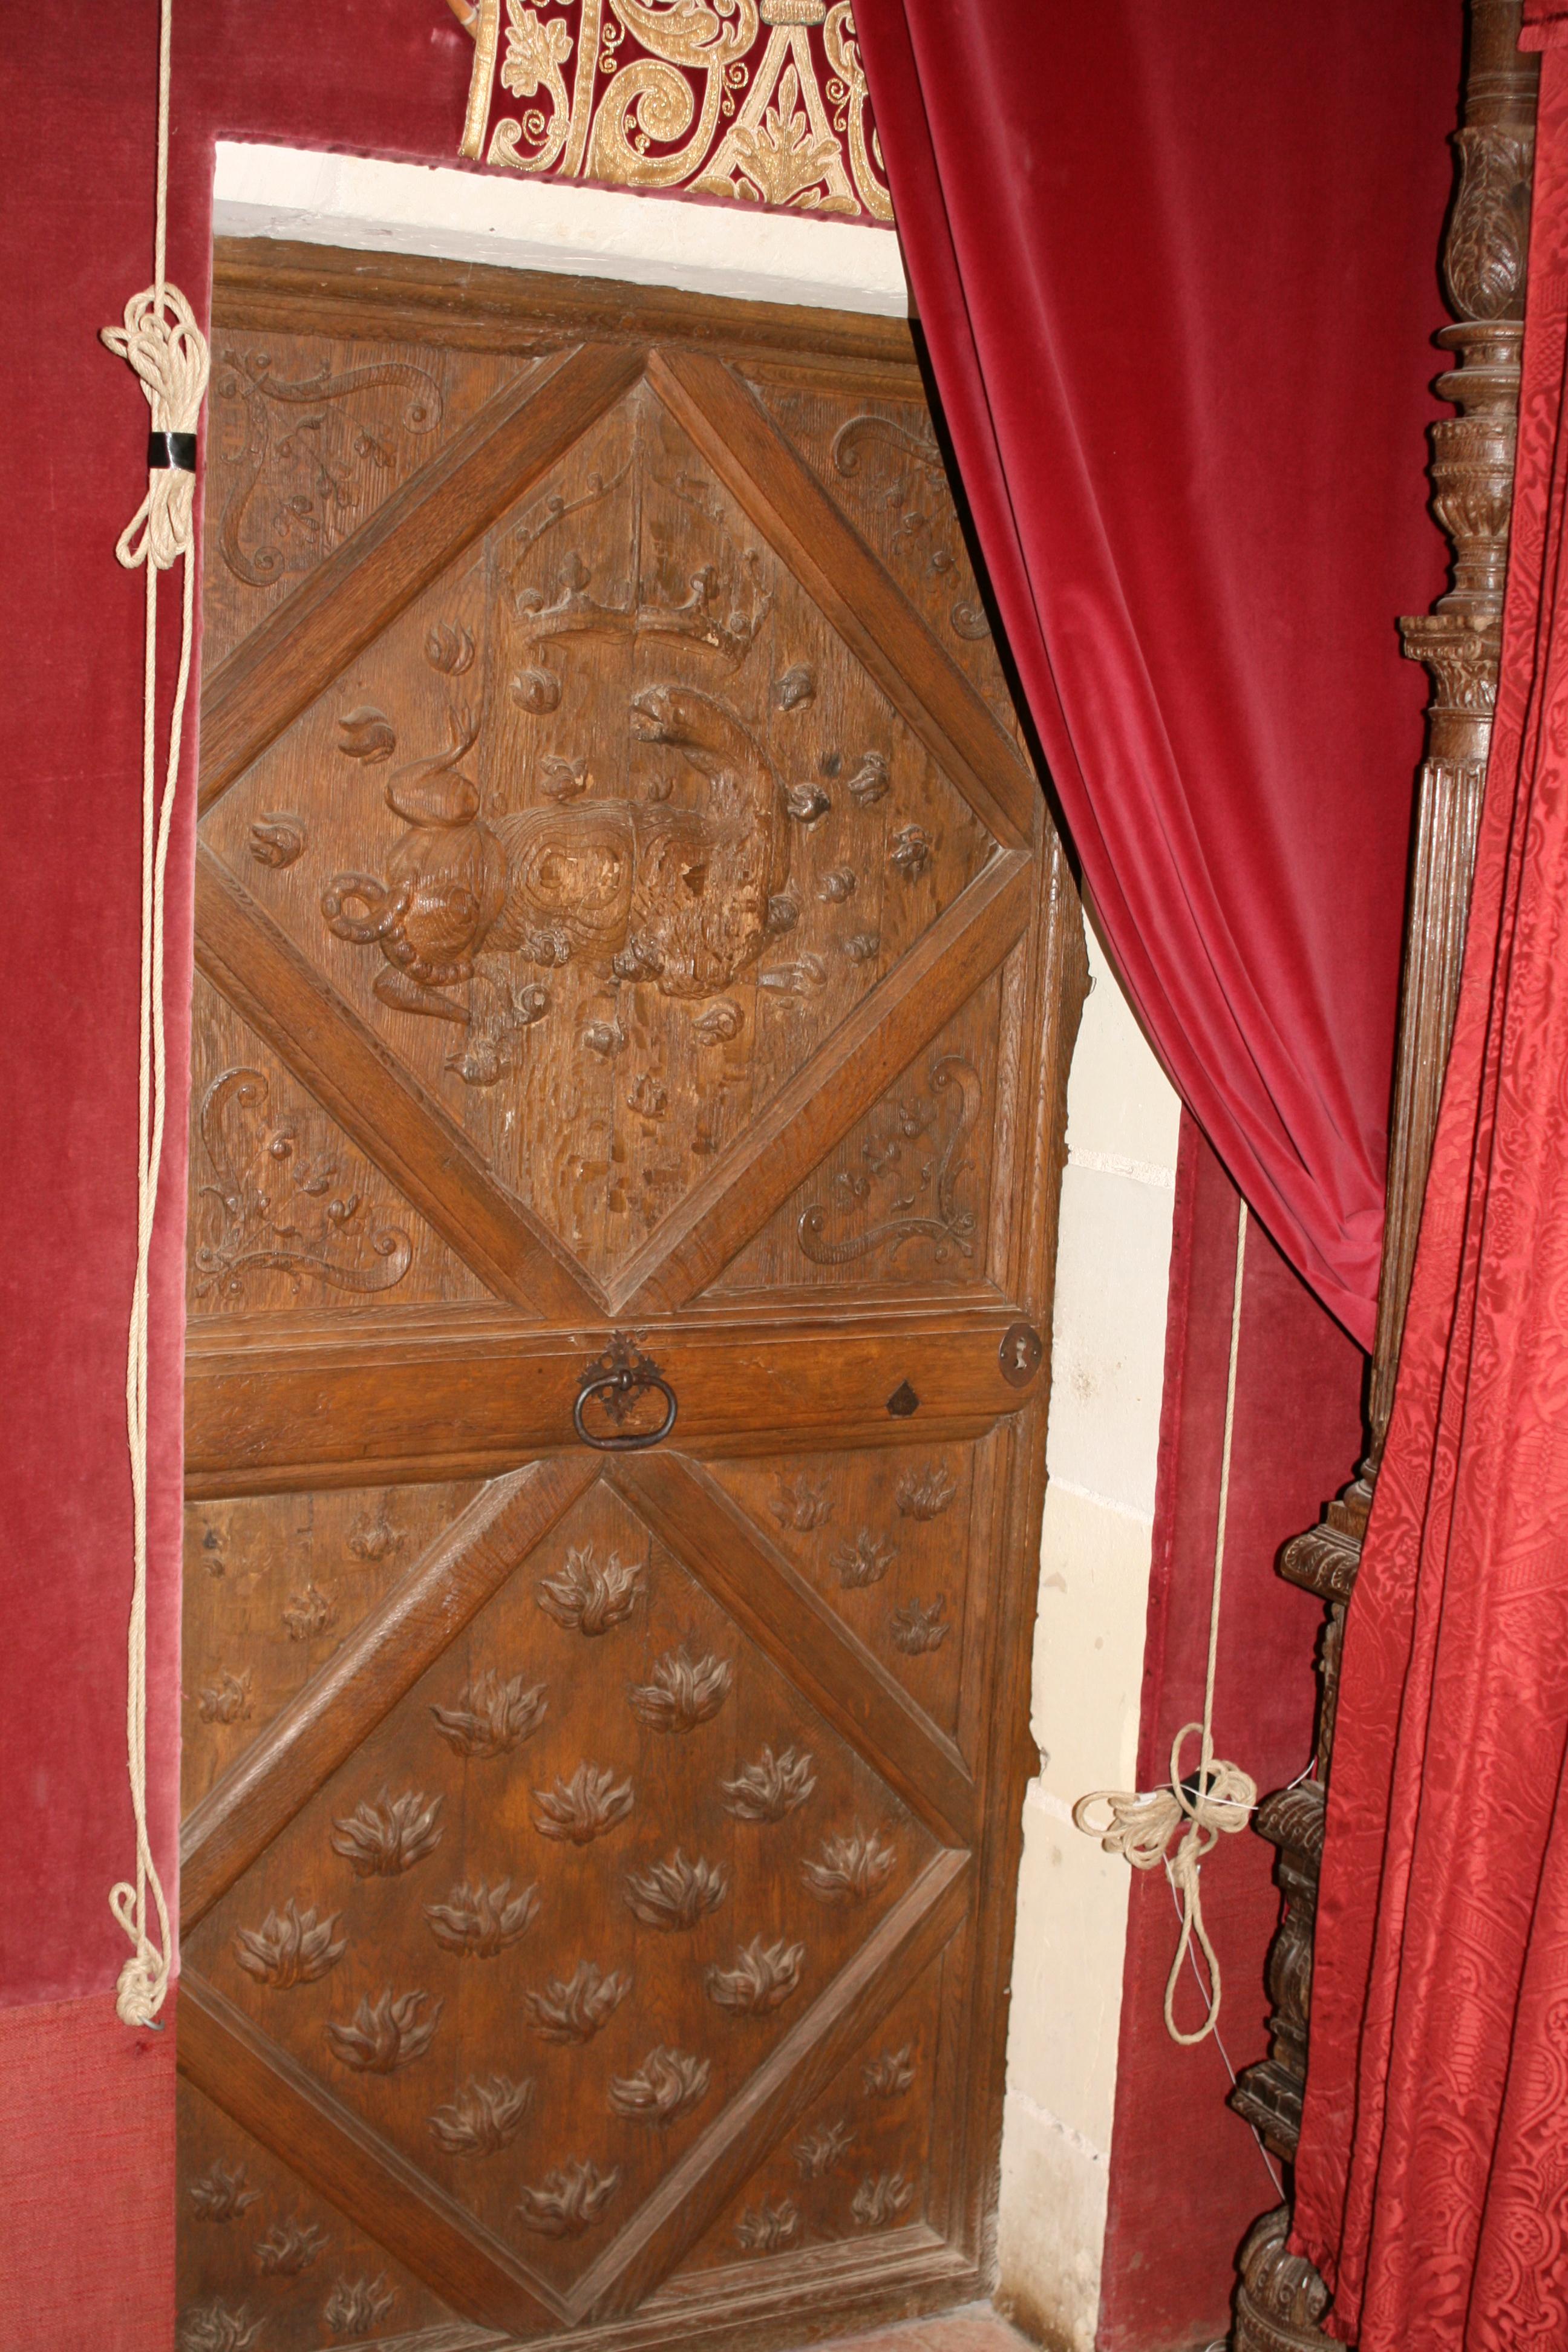 File:Porte Chambre Roi Chambord.jpg - Wikimedia Commons